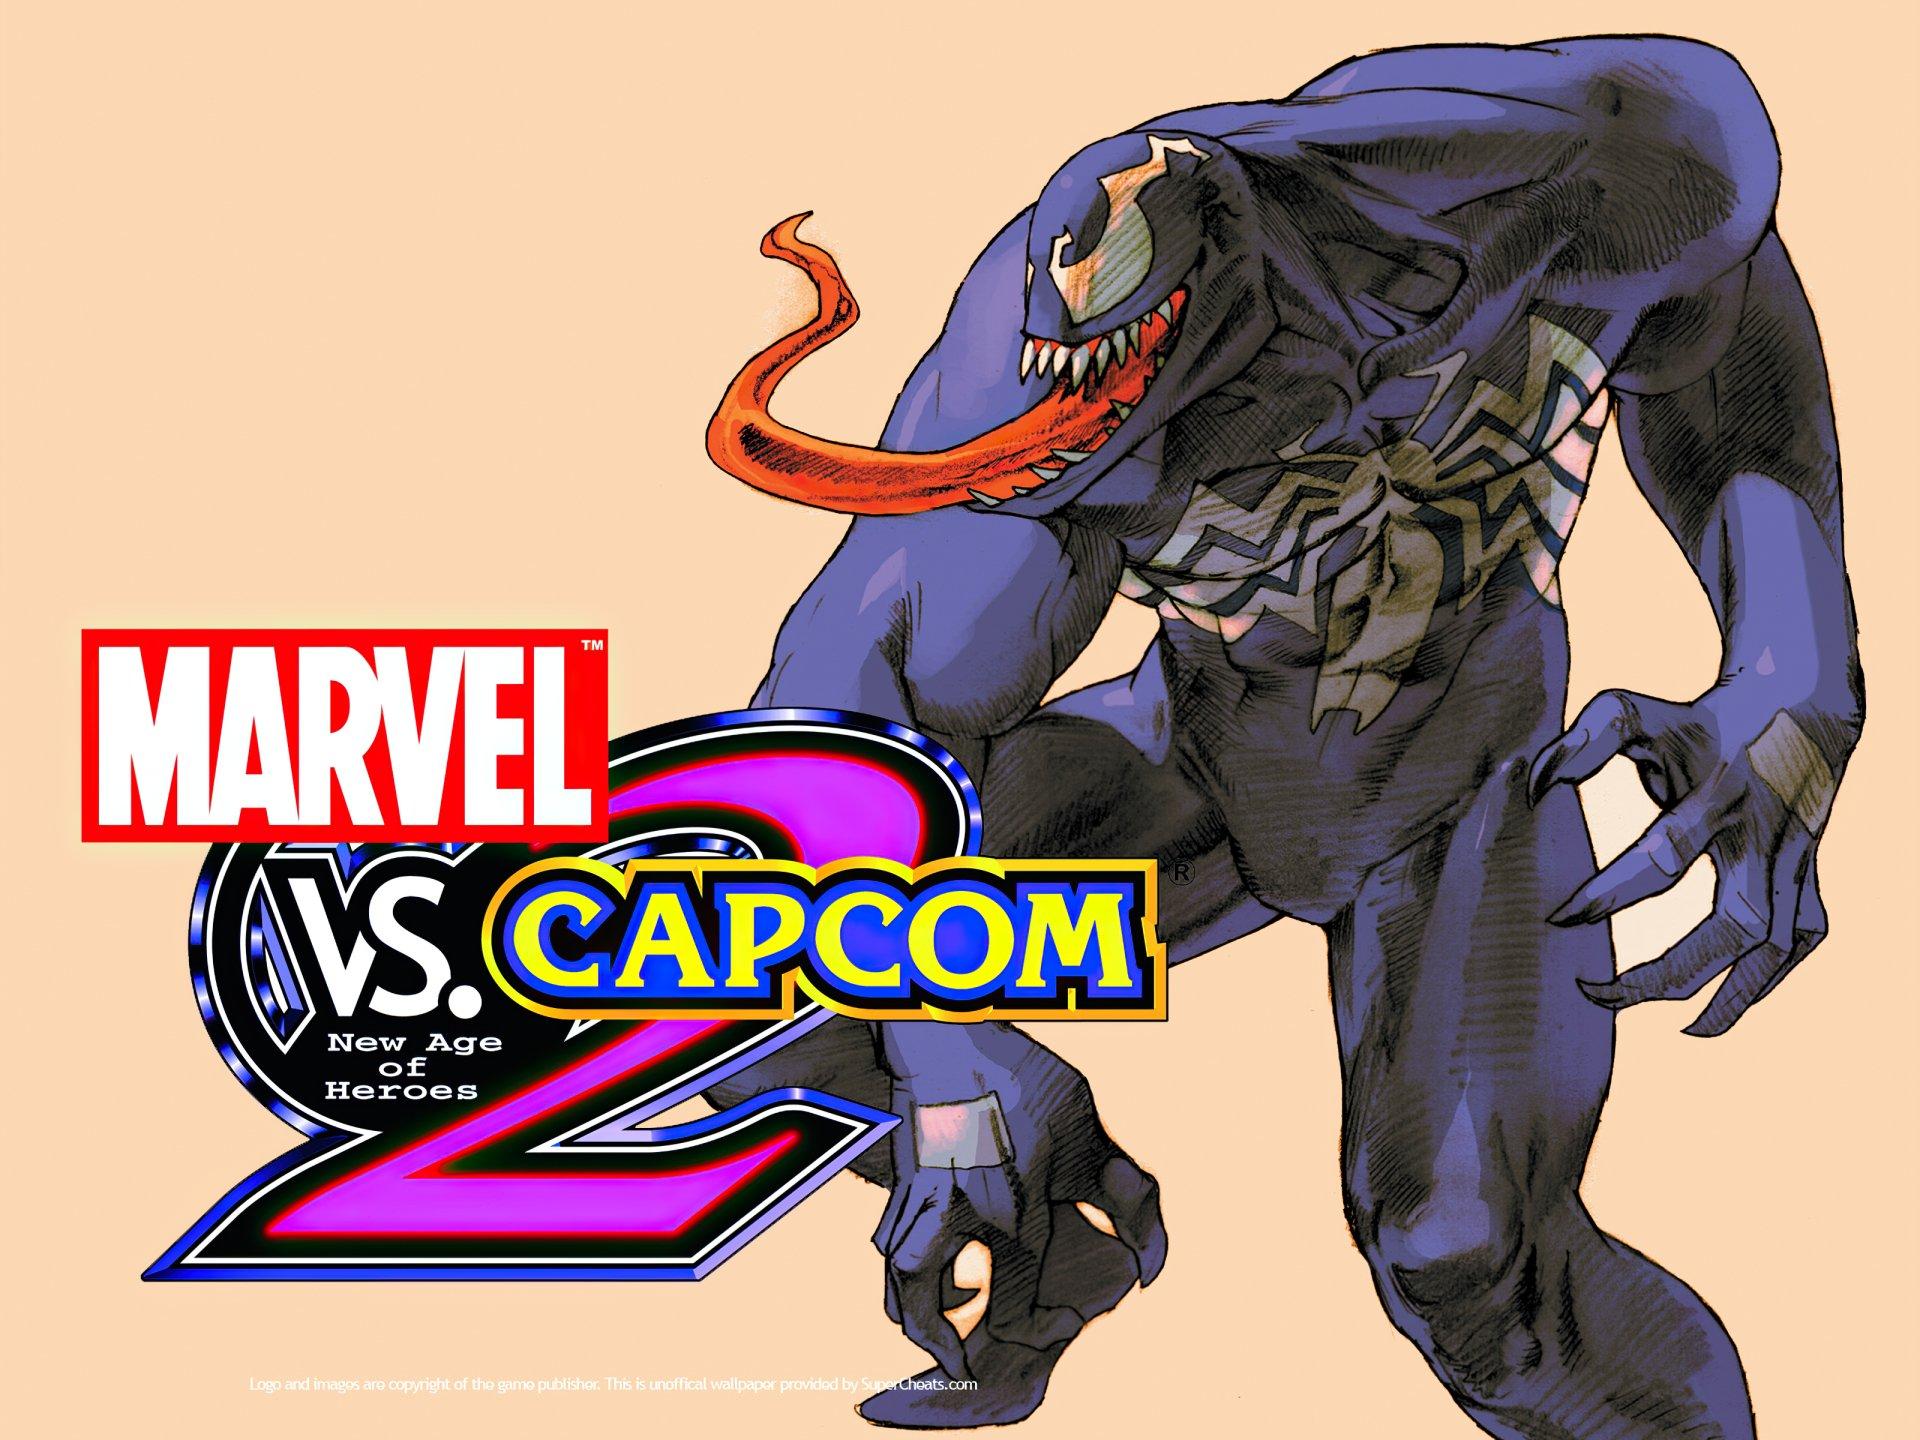 10 Marvel Vs Capcom 2 Hd Wallpapers Background Images